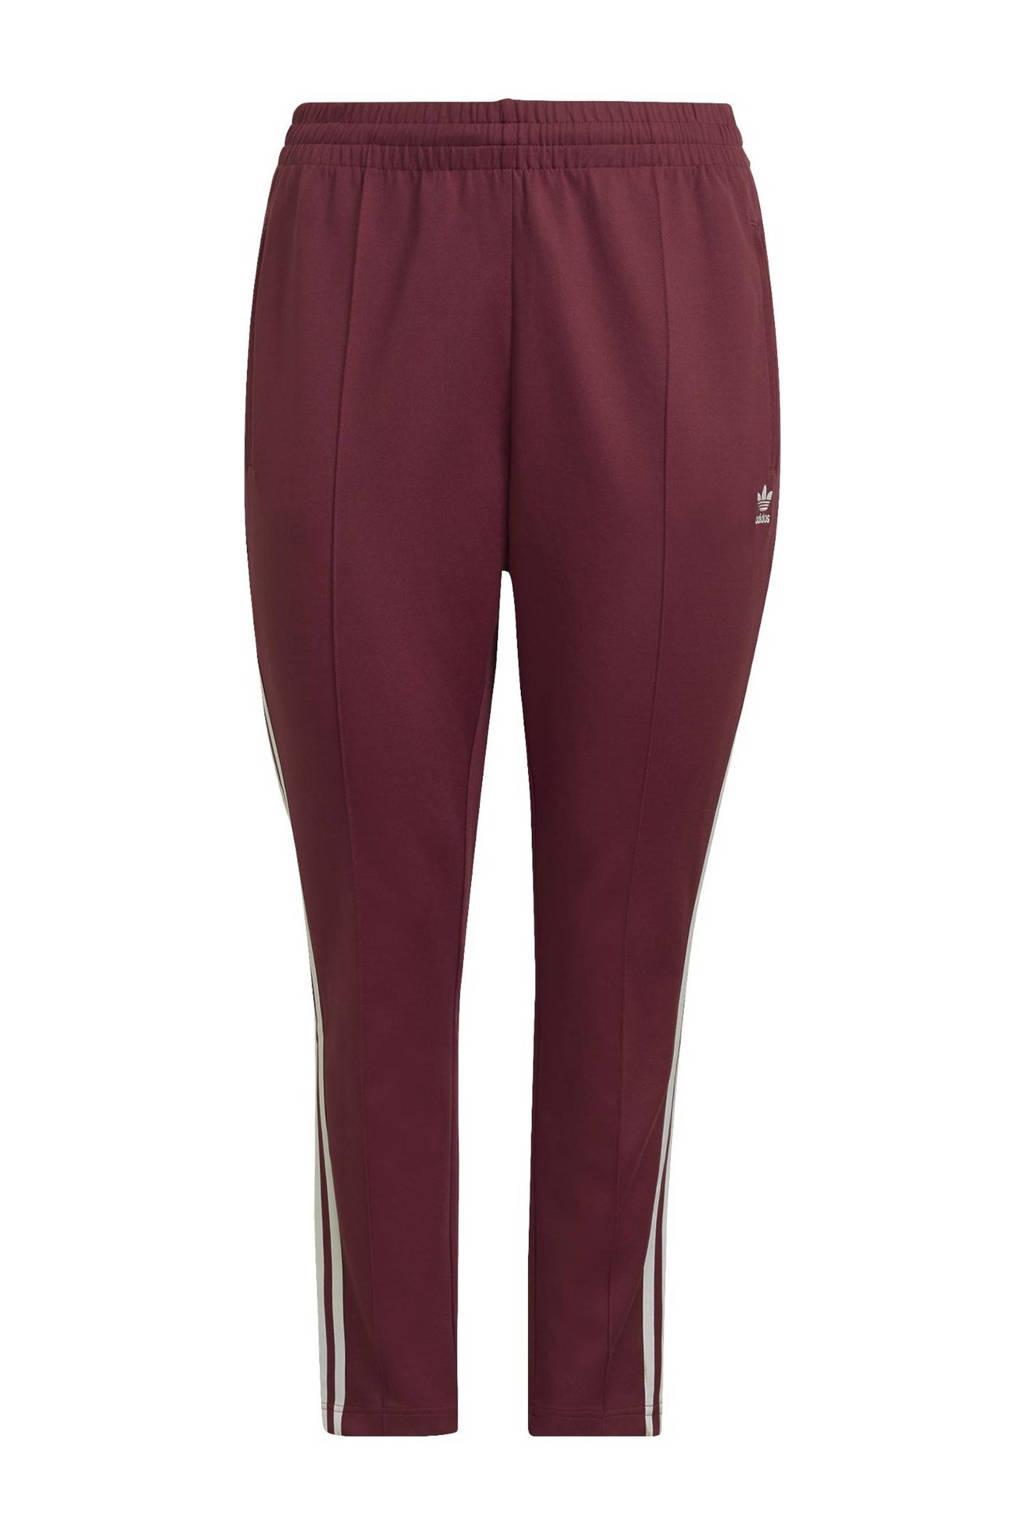 adidas Originals Plus Size Superstar joggingbroek donkerrood/wit, Donkerrood